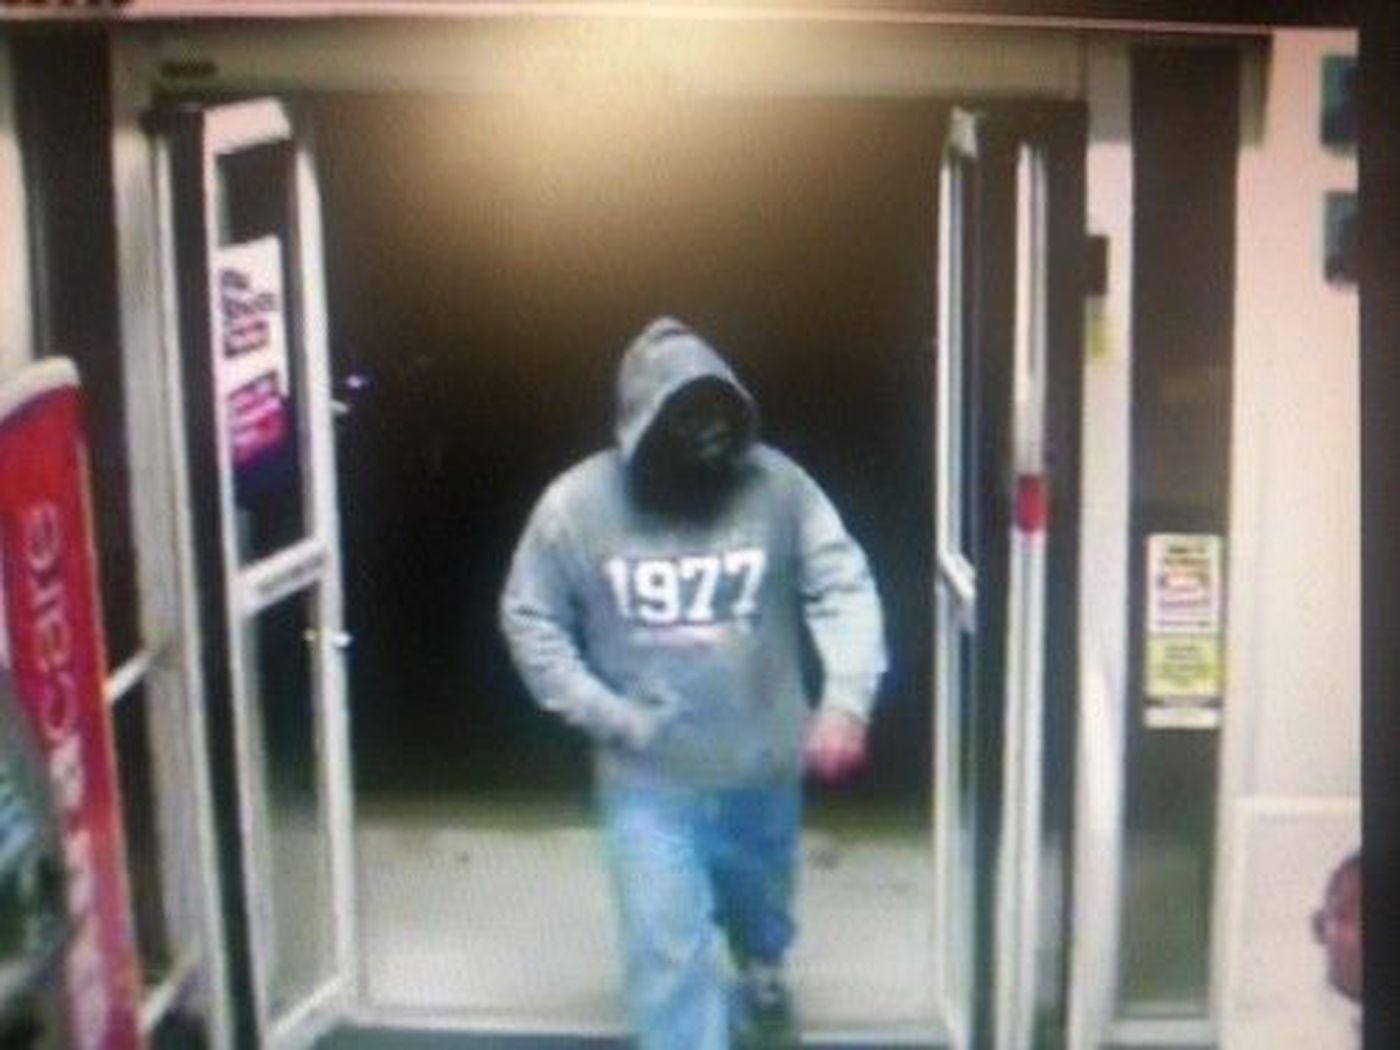 armed man wearing halloween mask robs cvs in gaston co